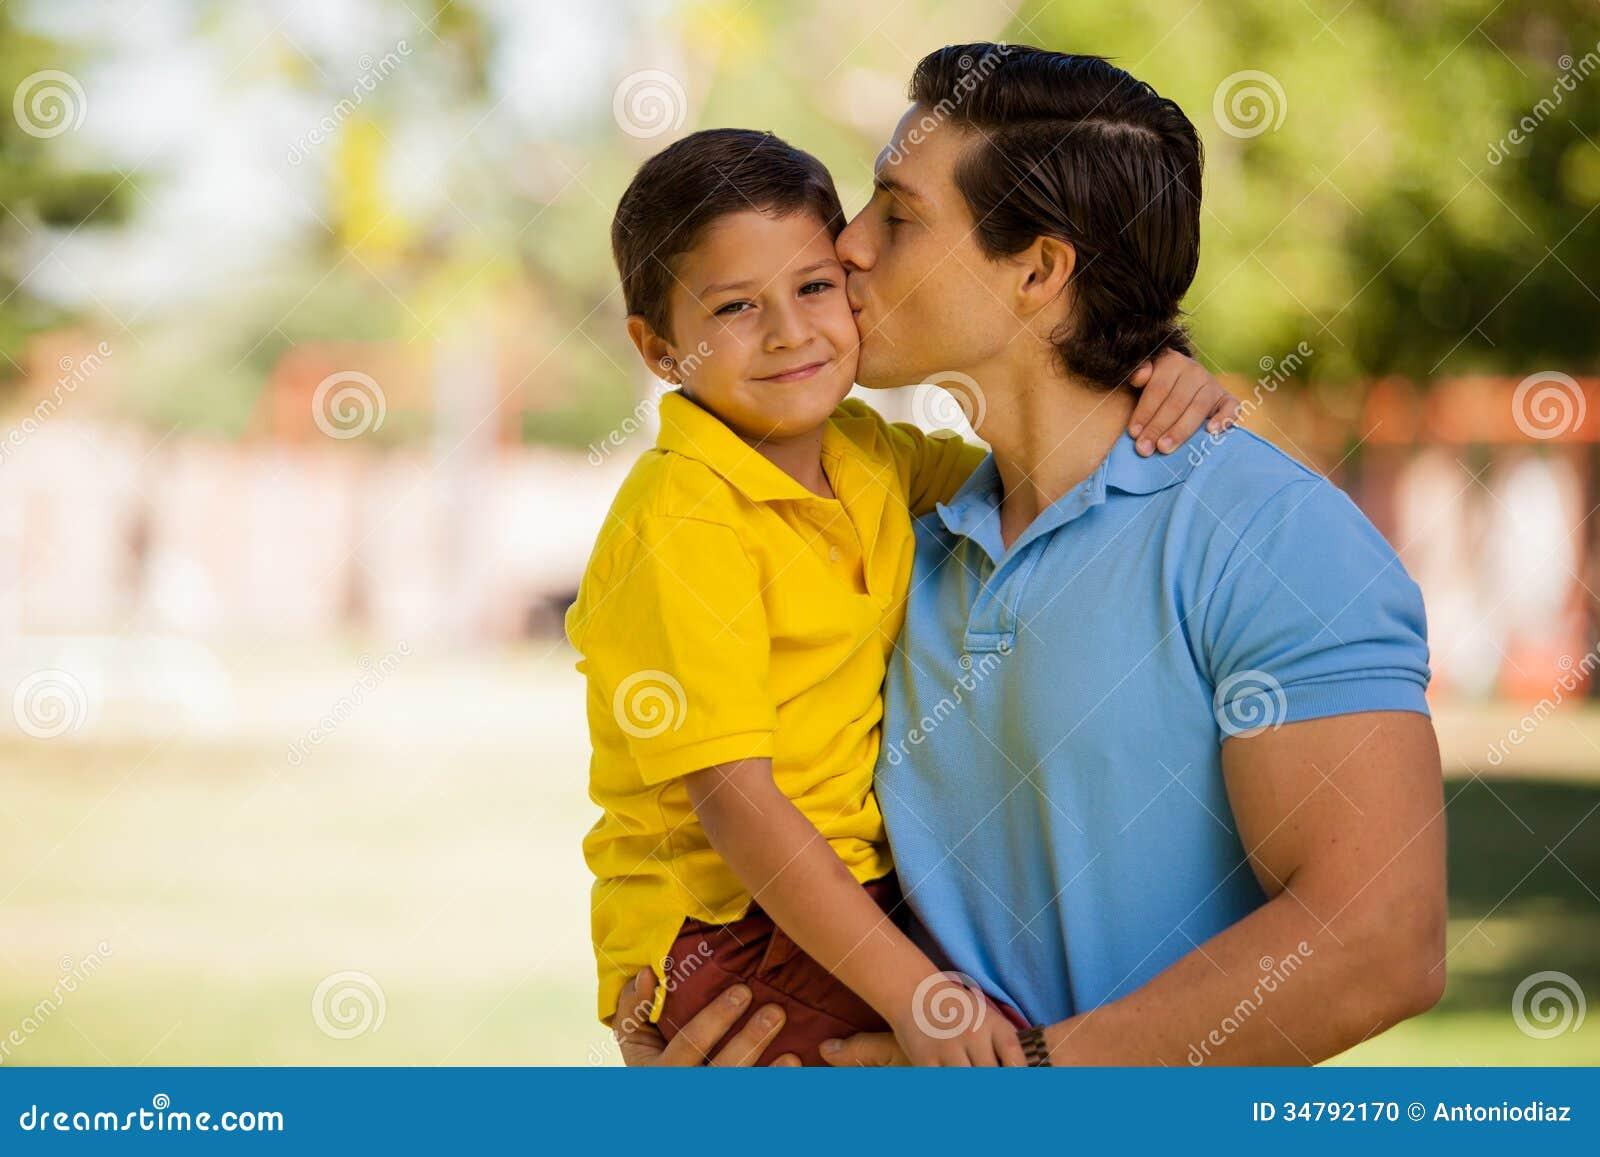 image Boy kiss a dad tube gay bareback buddies in